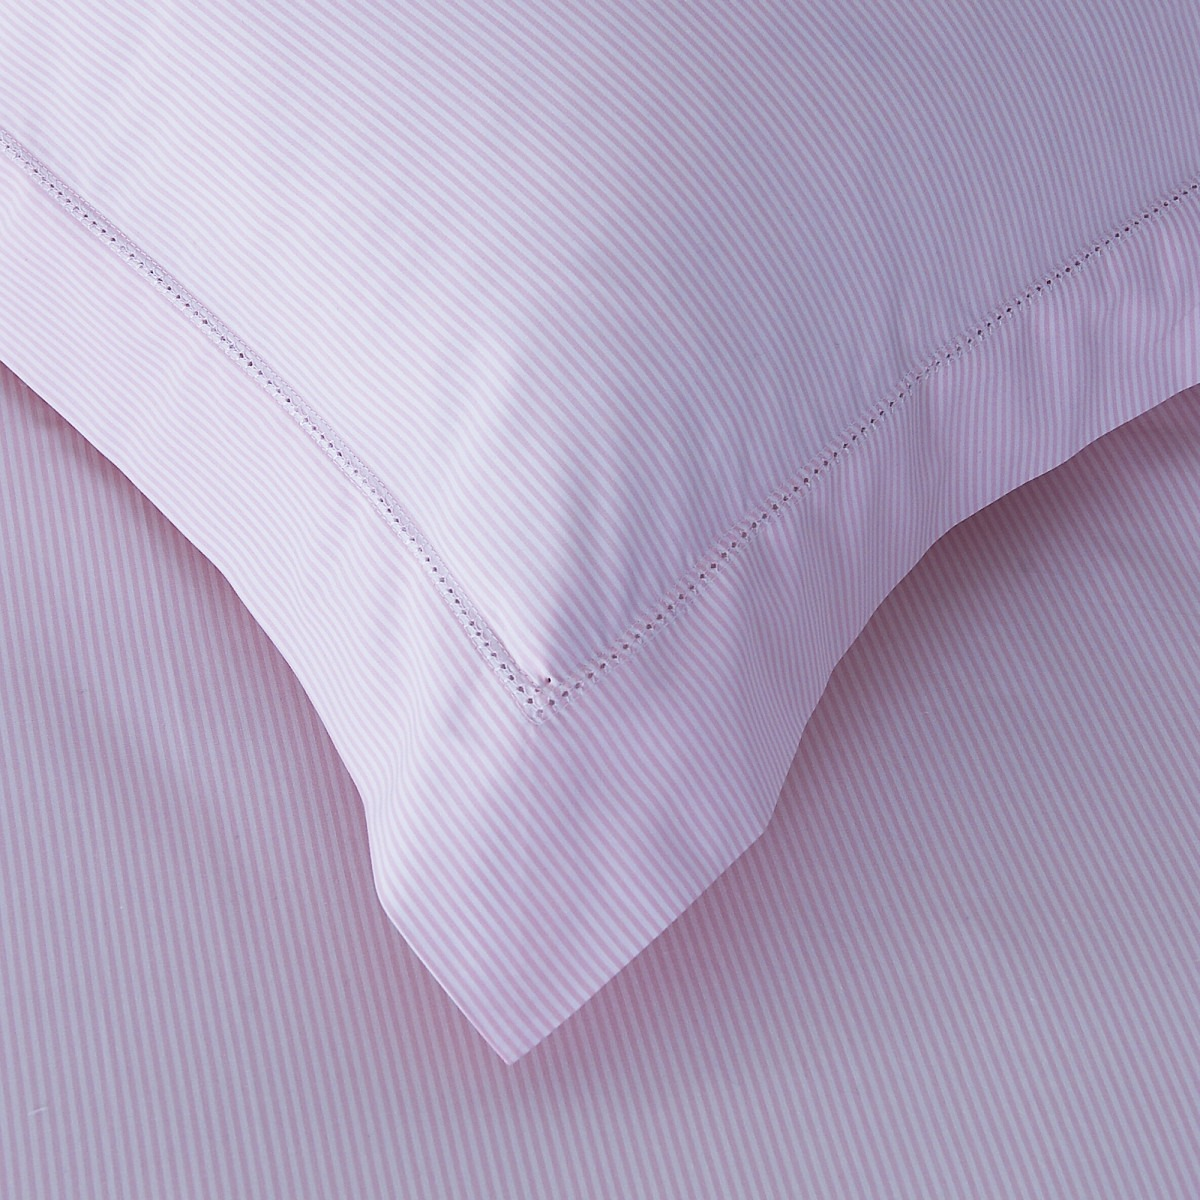 Pink Salcombe Stripe Cotton Bedlinen